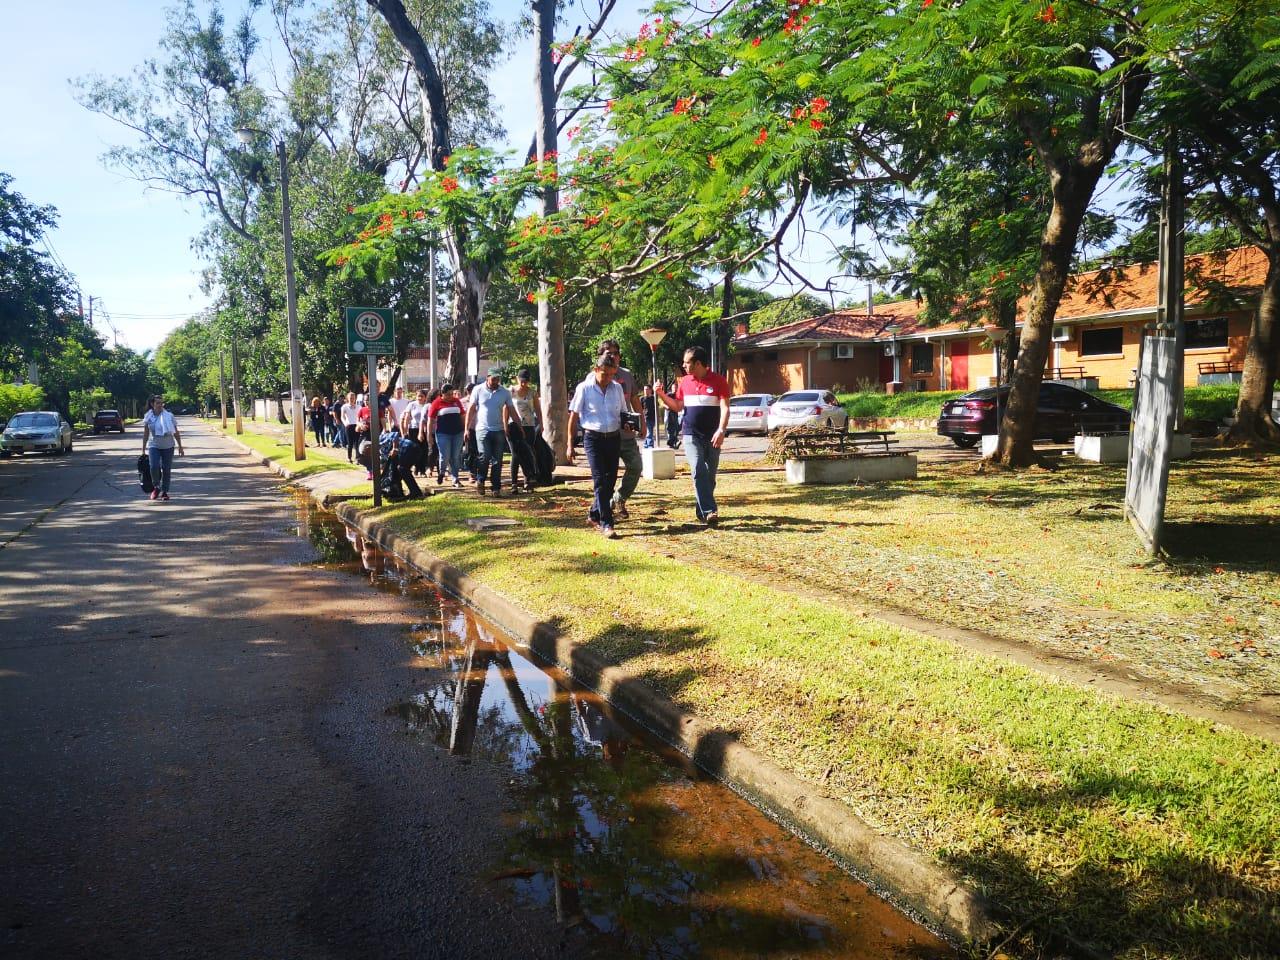 Minga para eliminar criaderos del mosquito transmisor del Dengue en el Campus